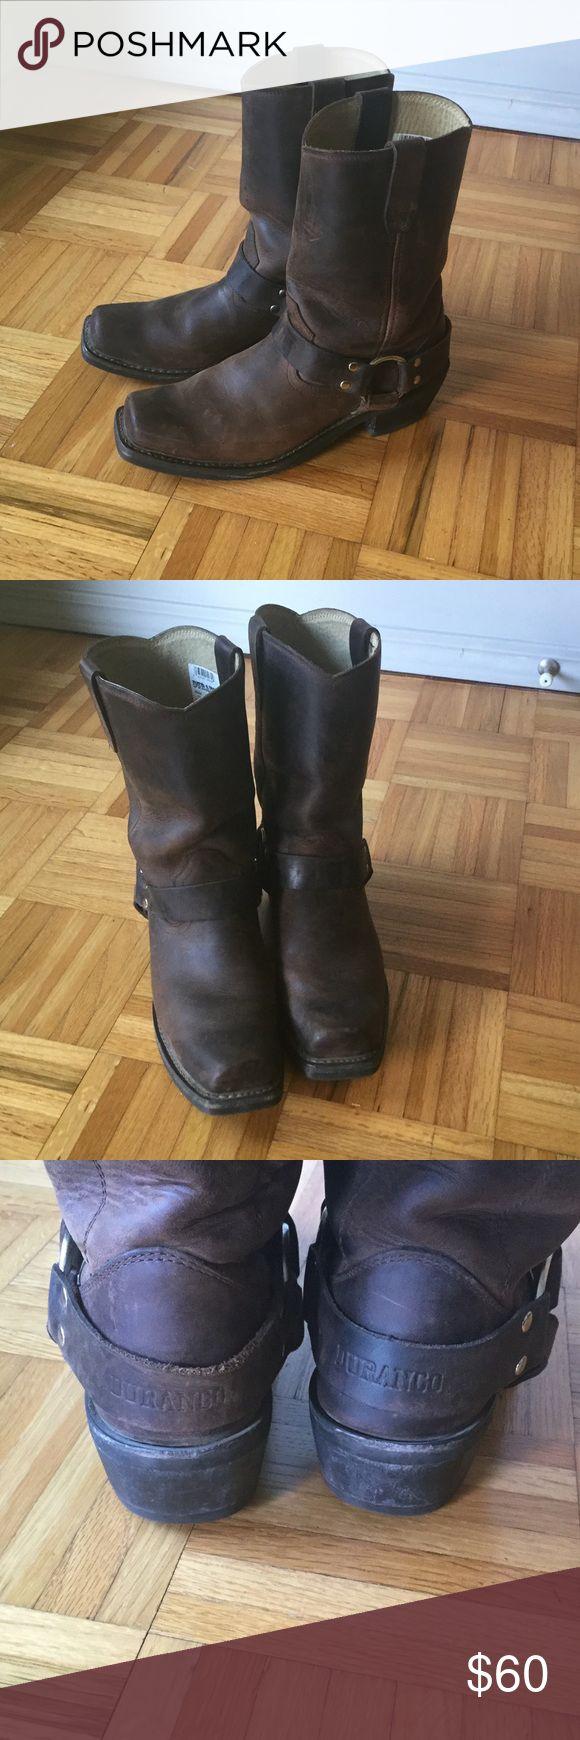 "Durango motor boots Classic design with 2"" heel. Very little wear. Durango Shoes Combat & Moto Boots"